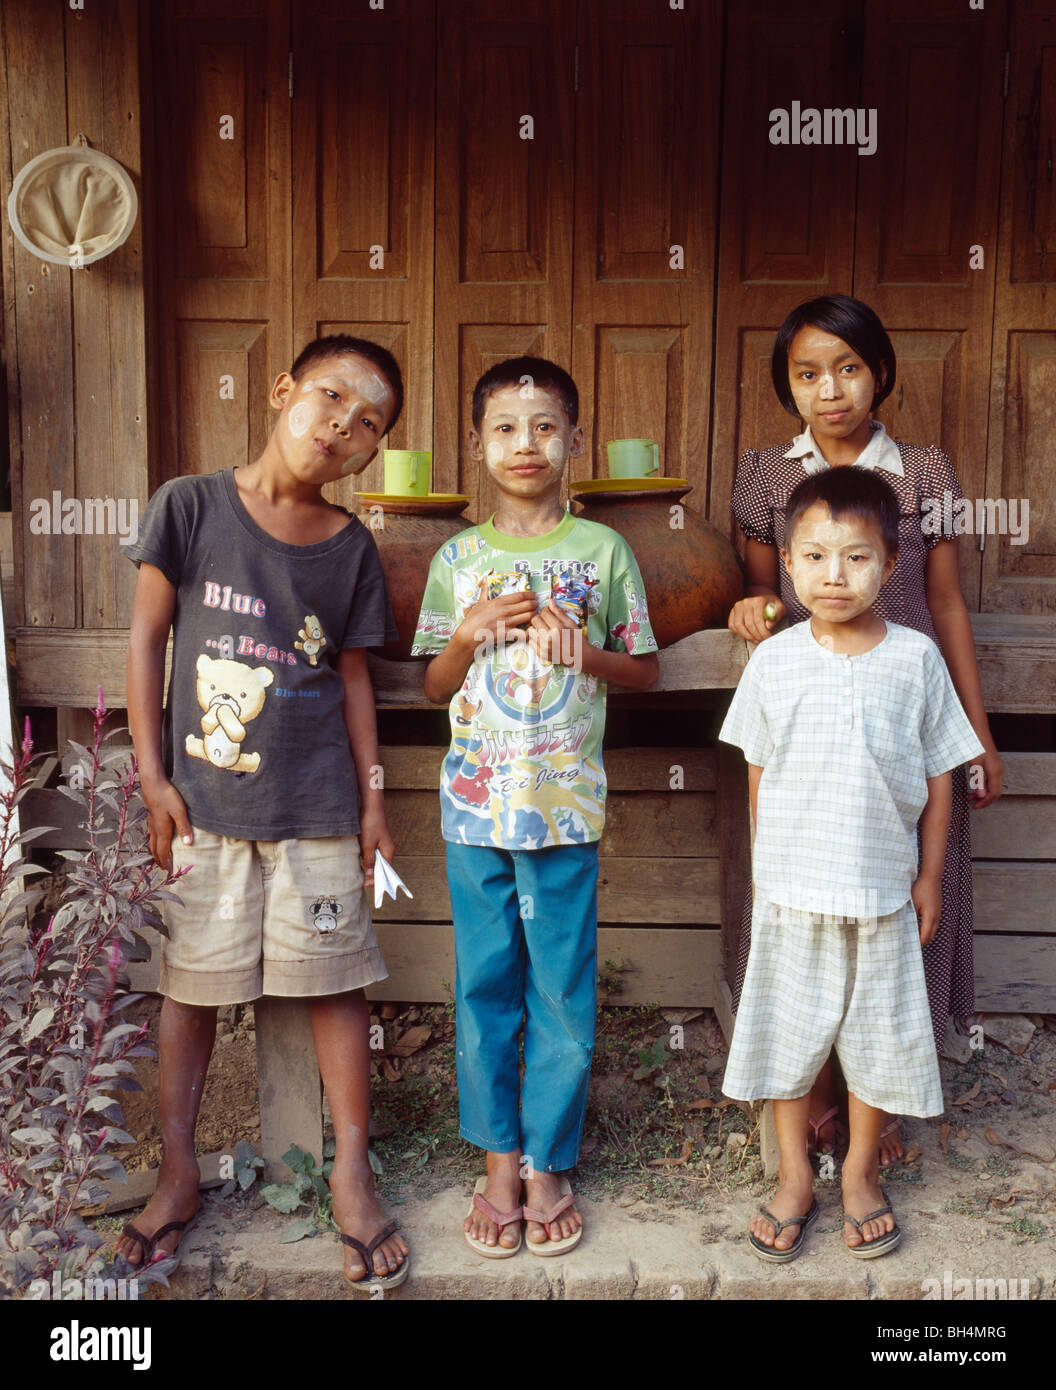 4 four children posing in front of a house and clay jugs with water Vier Kinder posieren vor Trinkwasserkrügen - Stock Image